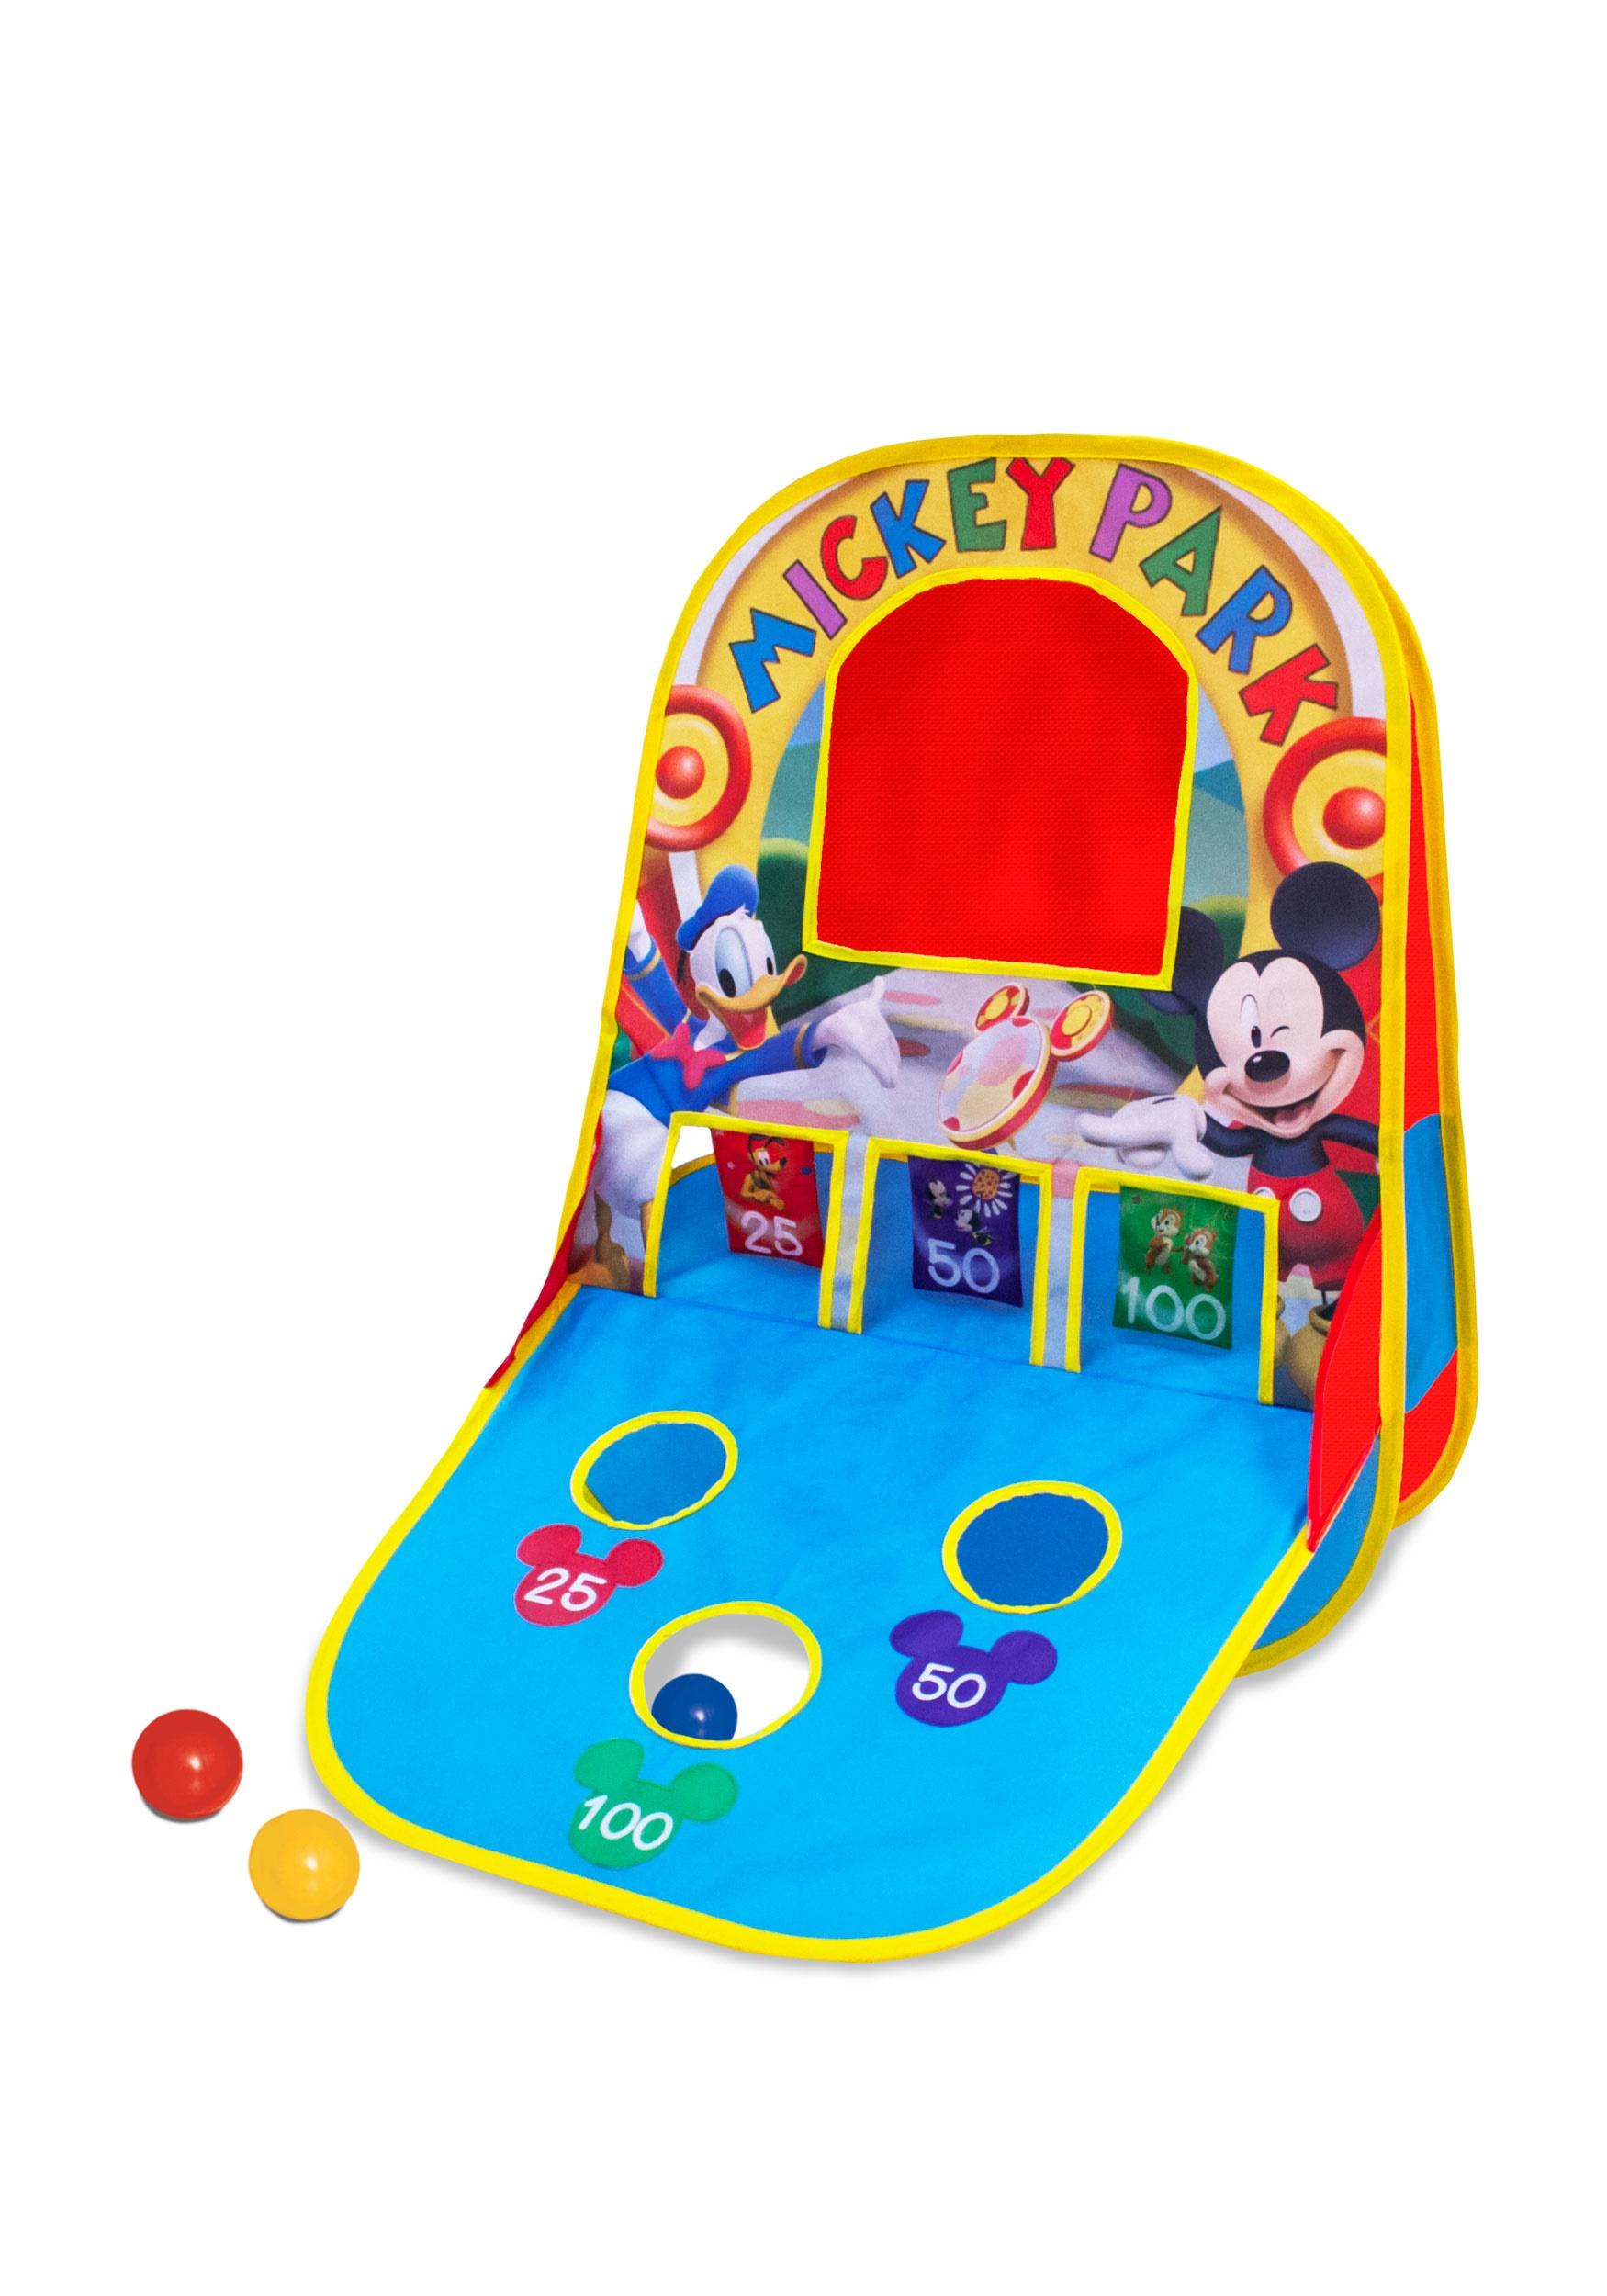 Mickey Triple Shot Game Center.